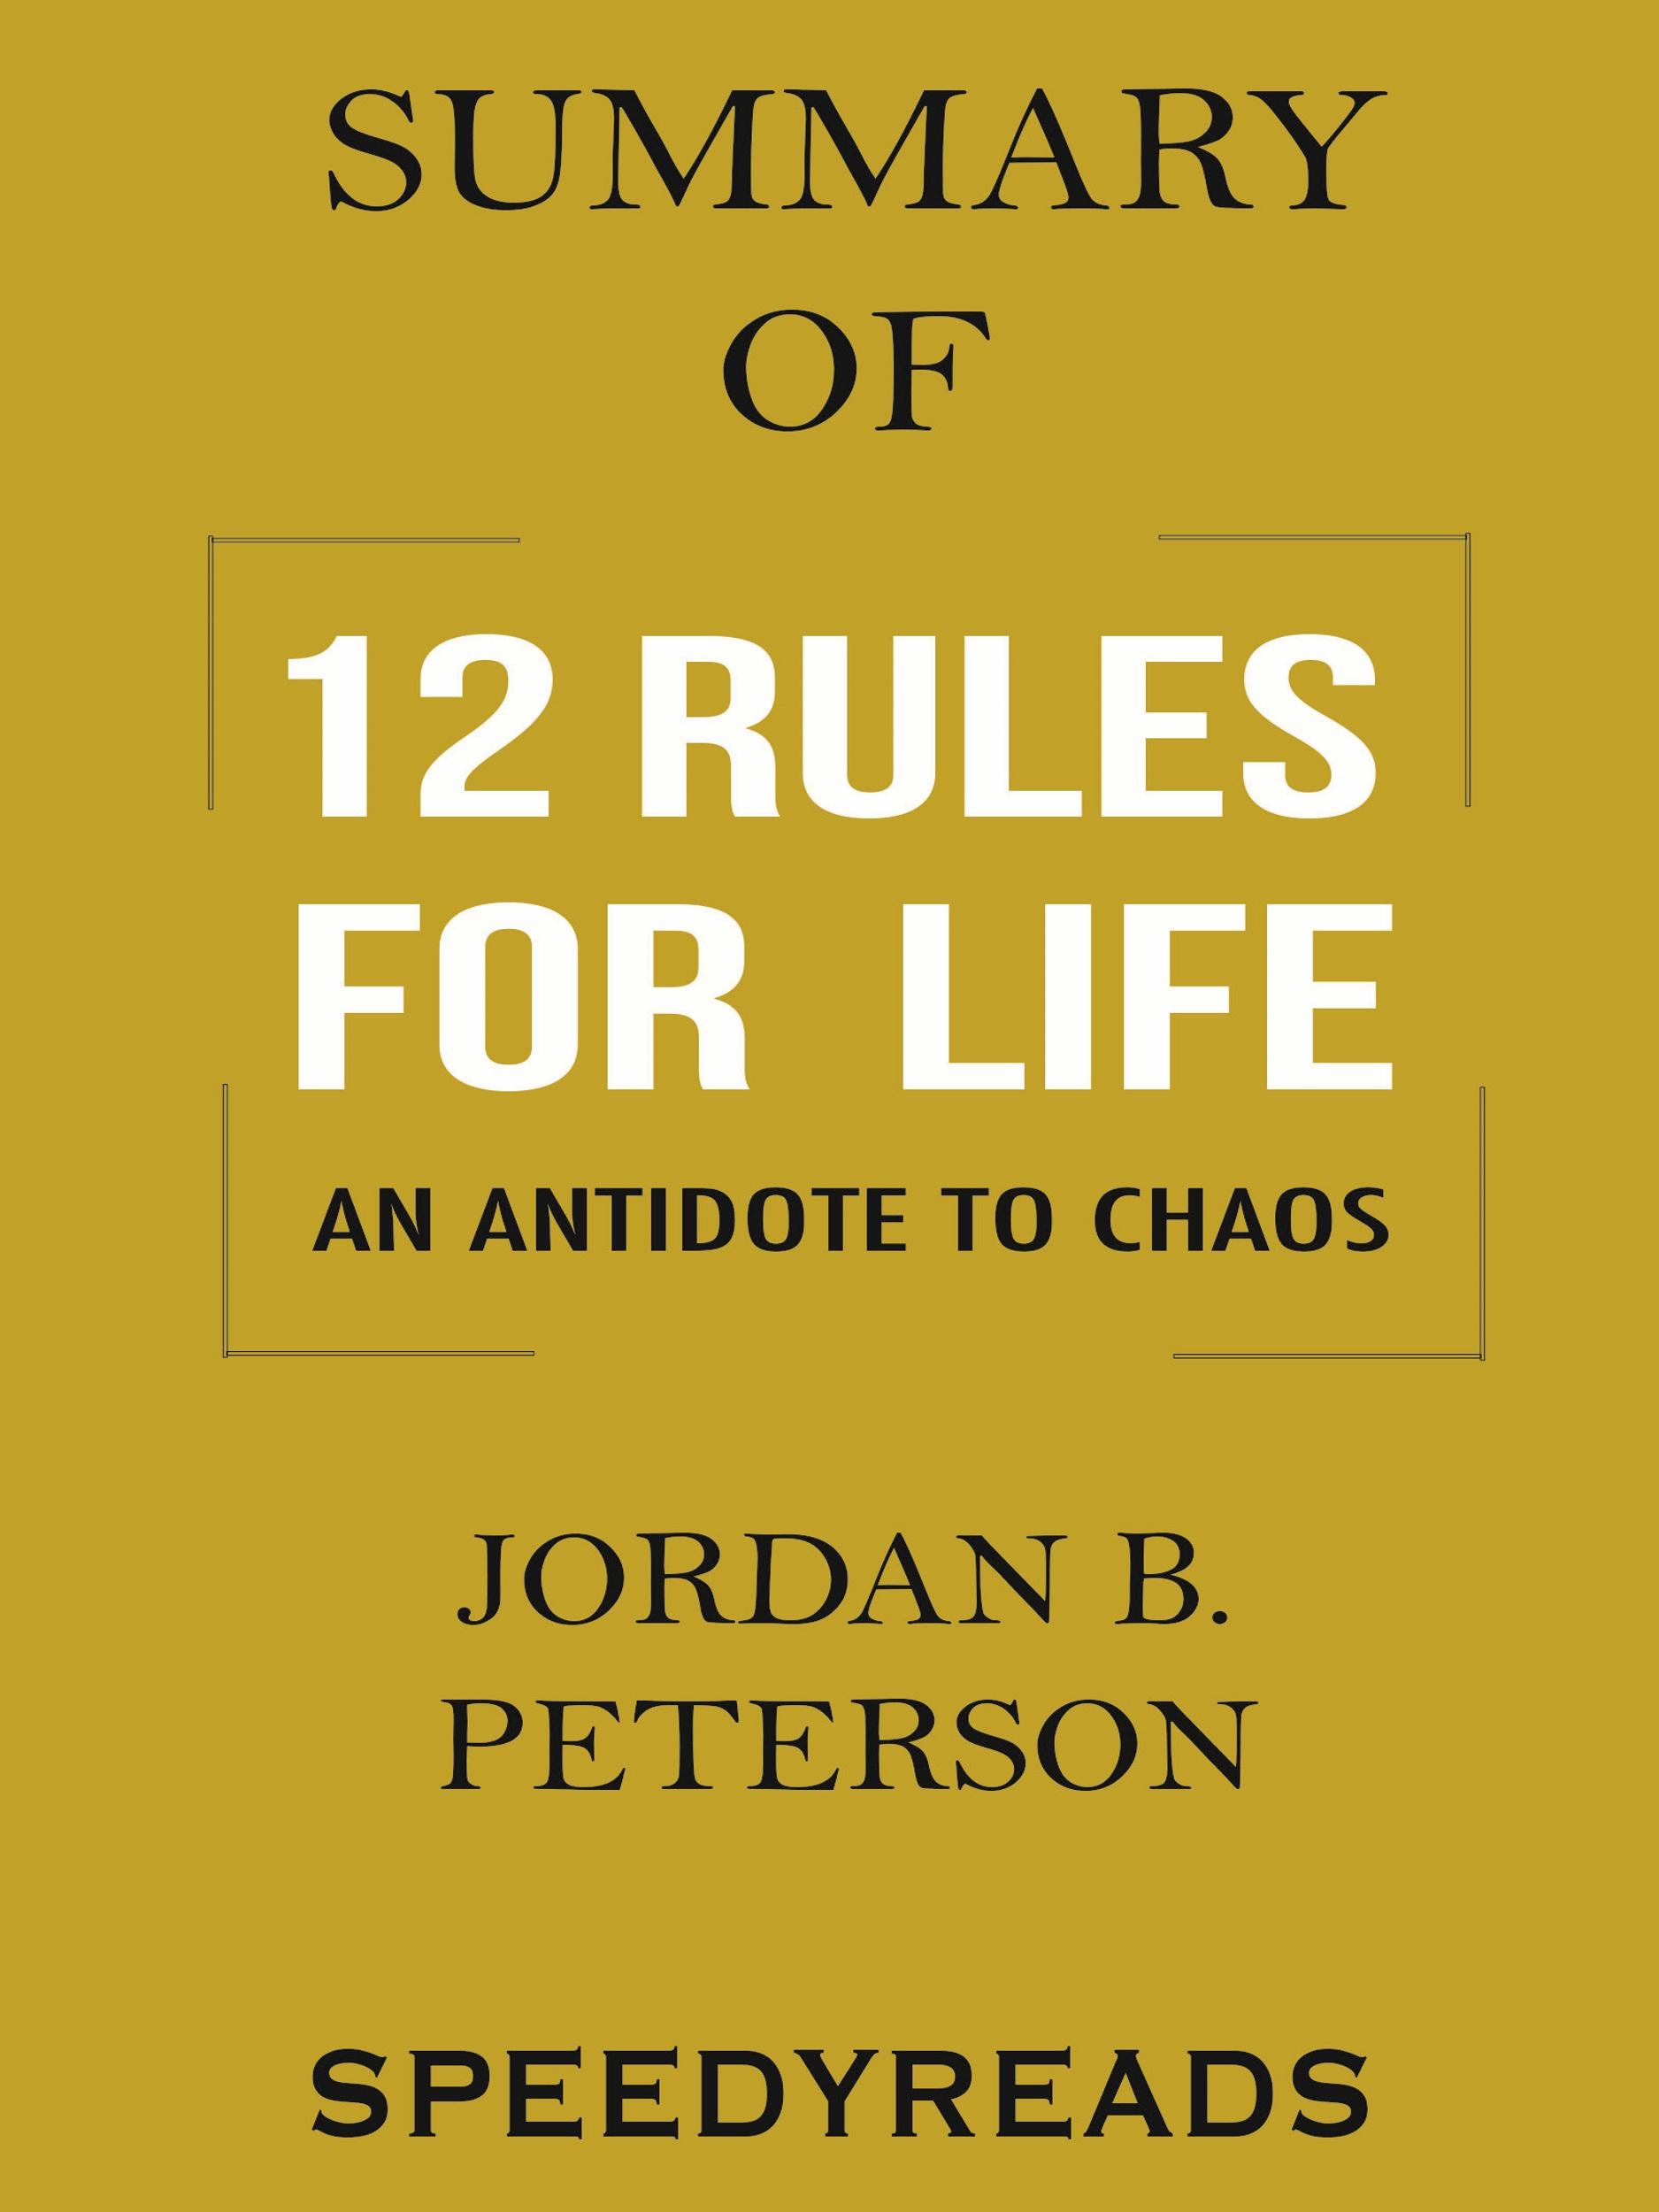 jordan peterson books